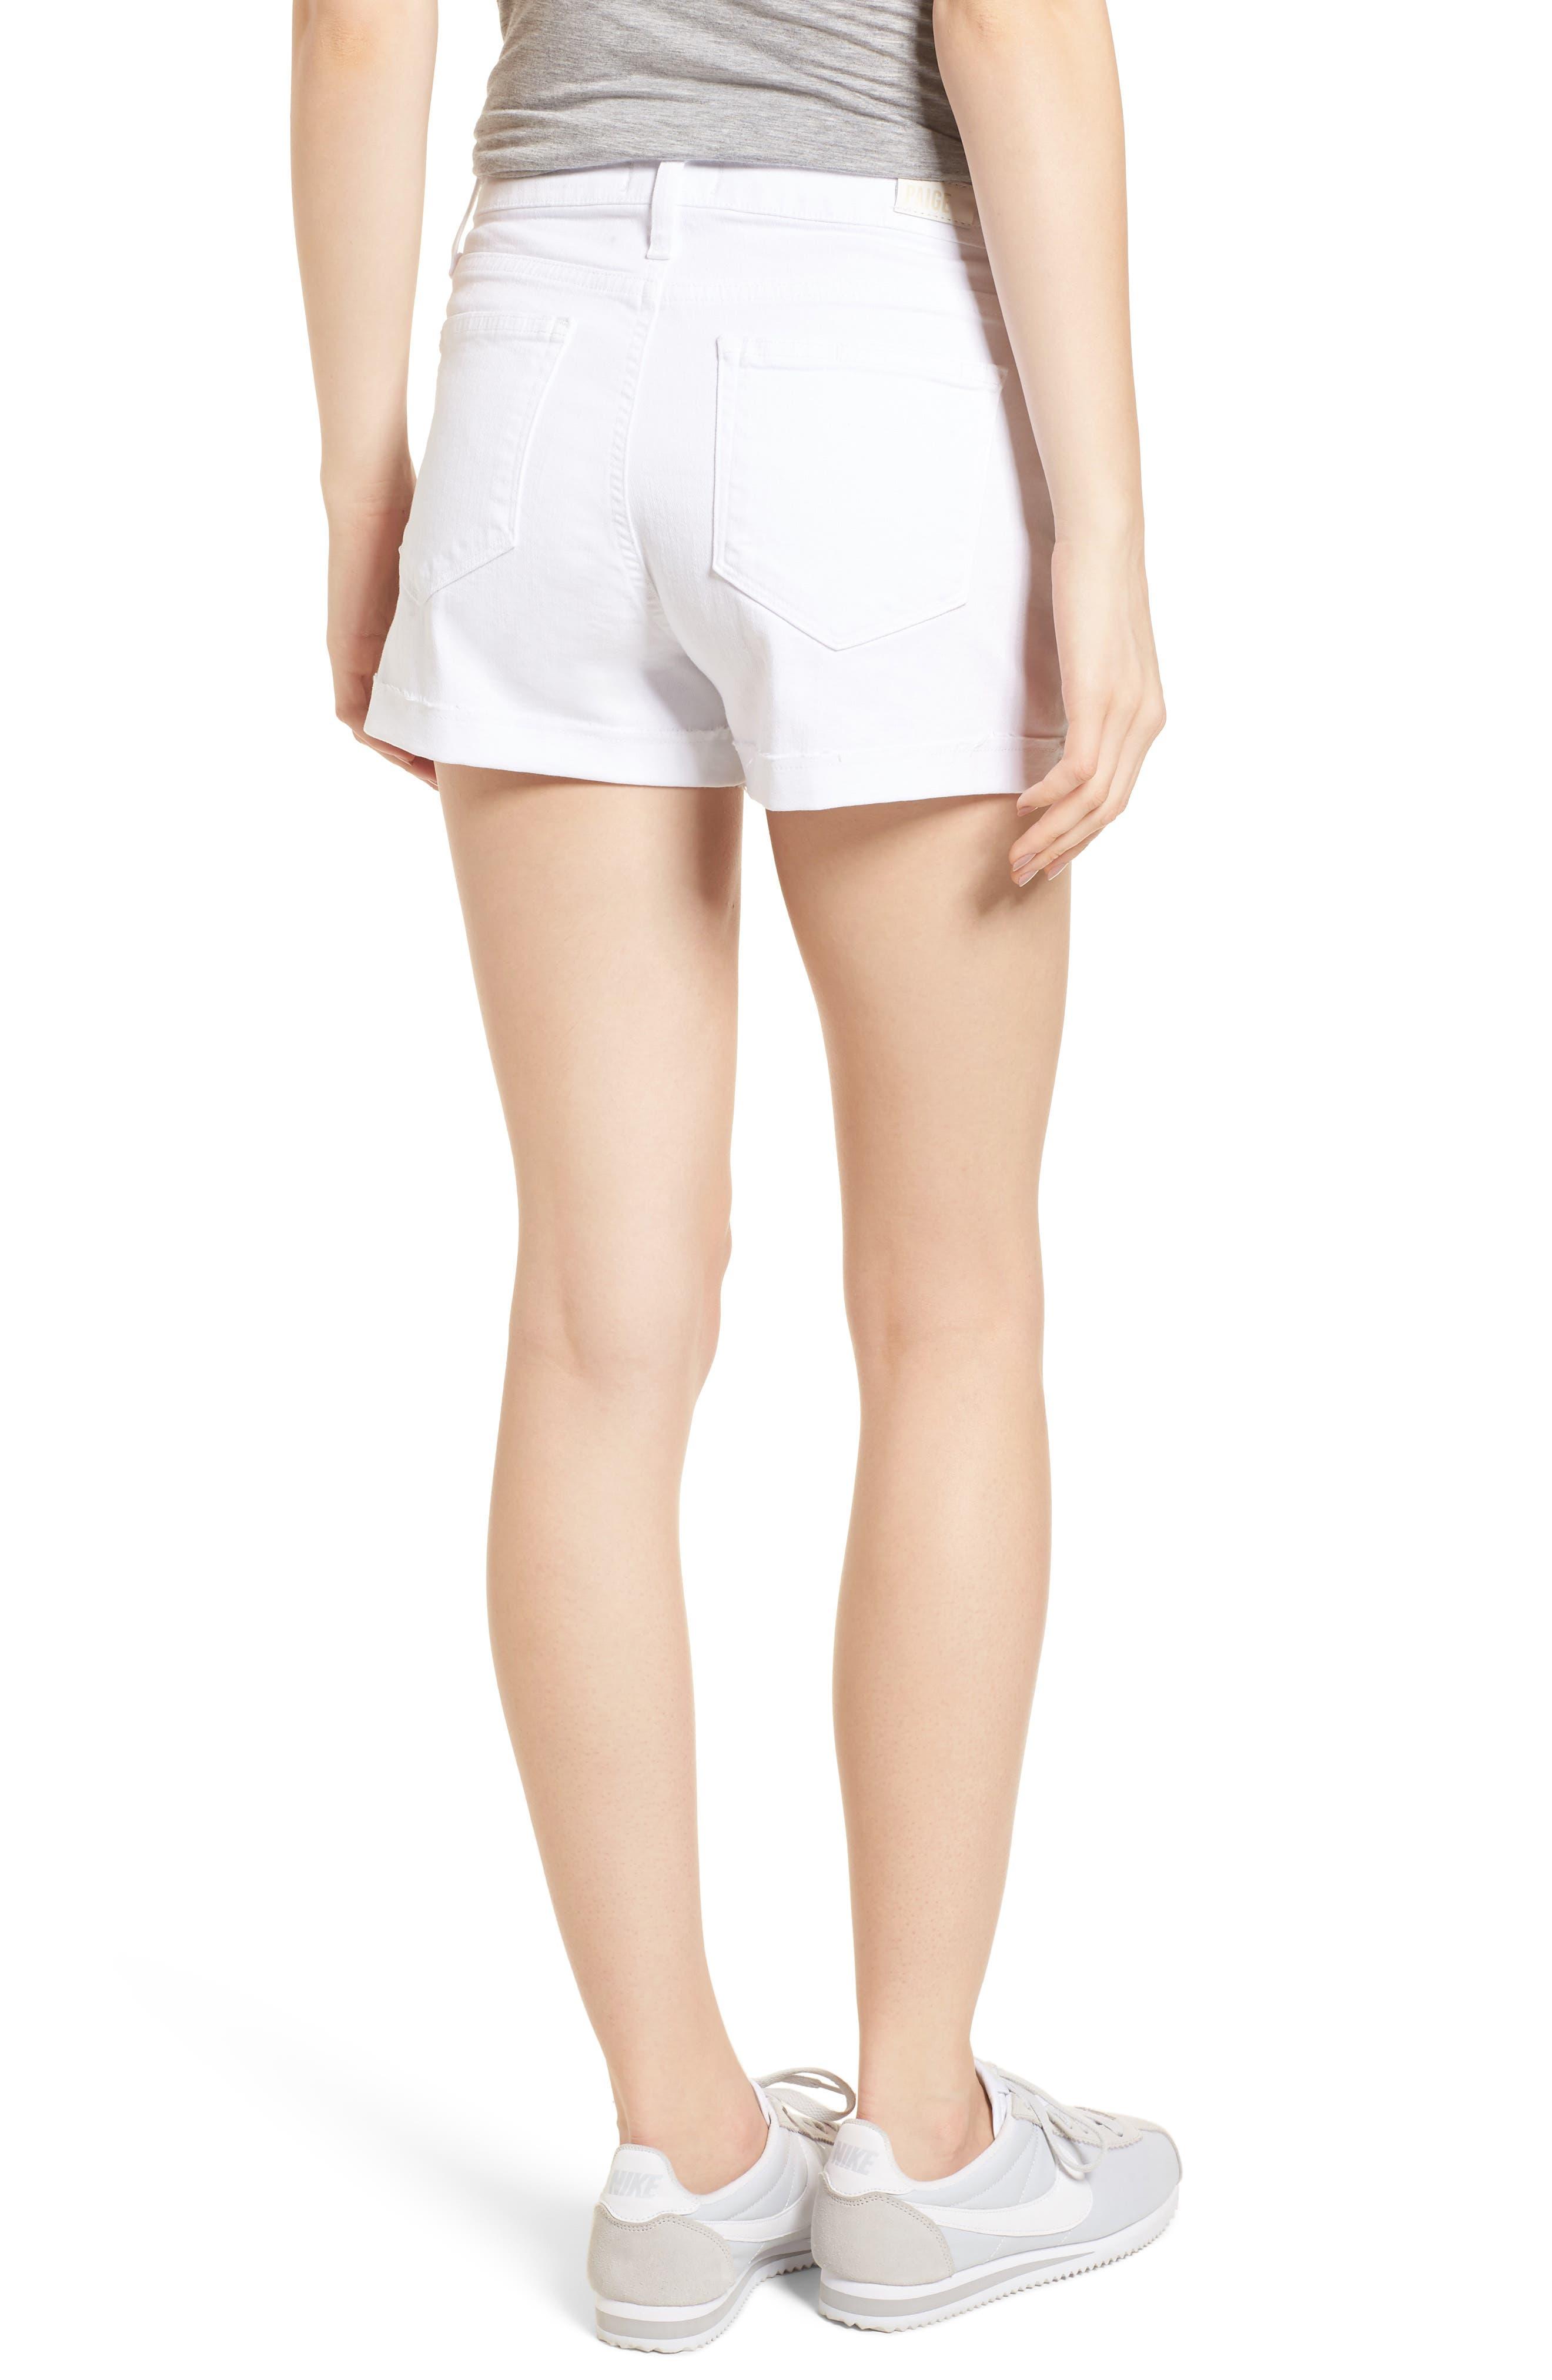 Jimmy Jimmy High Waist Denim Shorts,                             Alternate thumbnail 2, color,                             Crisp White